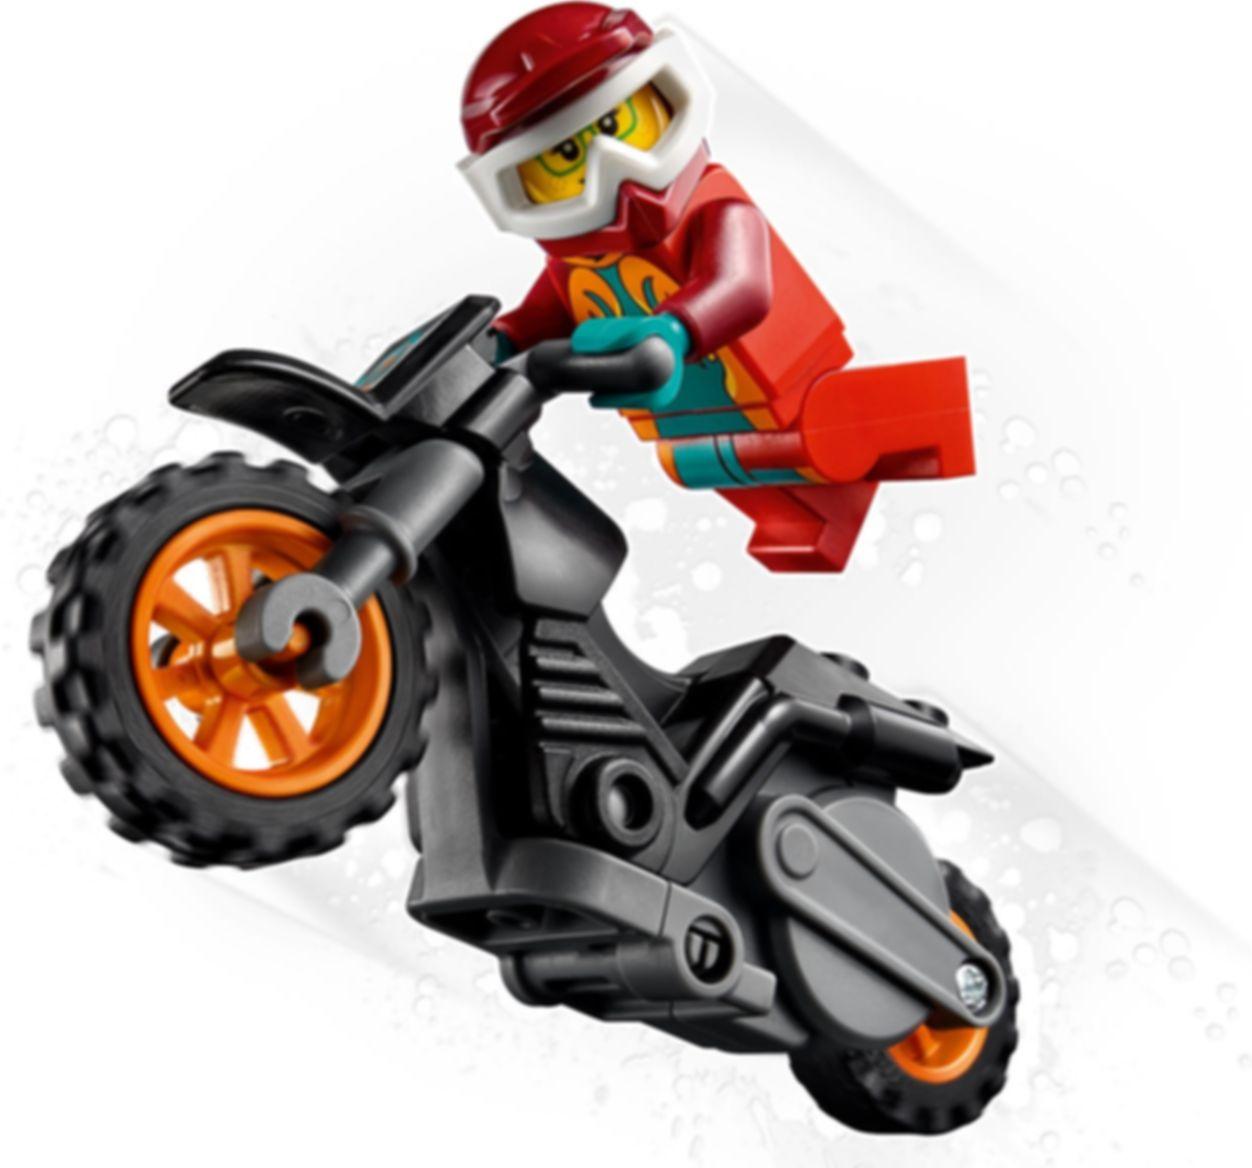 LEGO® City Fire Stunt Bike gameplay